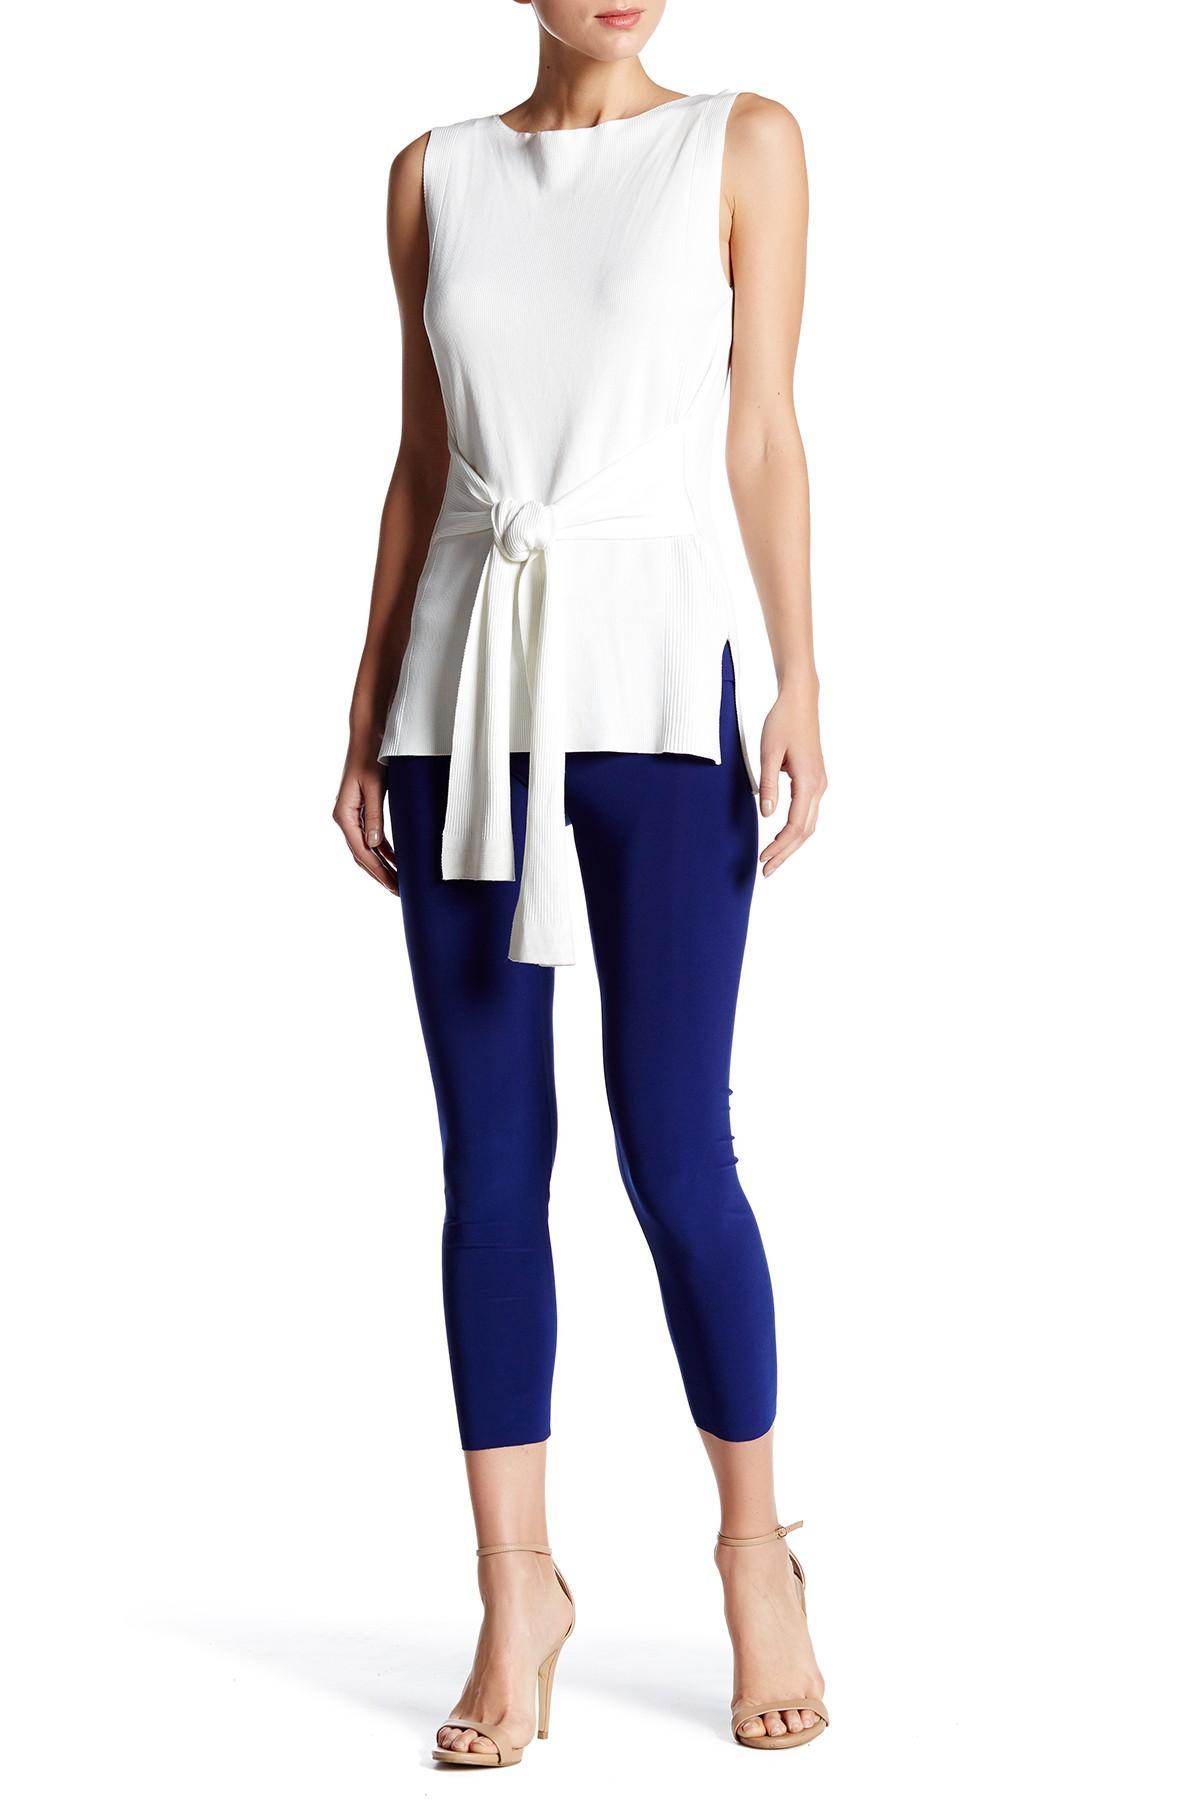 Lyst norma kamali tapered legging in blue - Norma kamali costumi da bagno ...